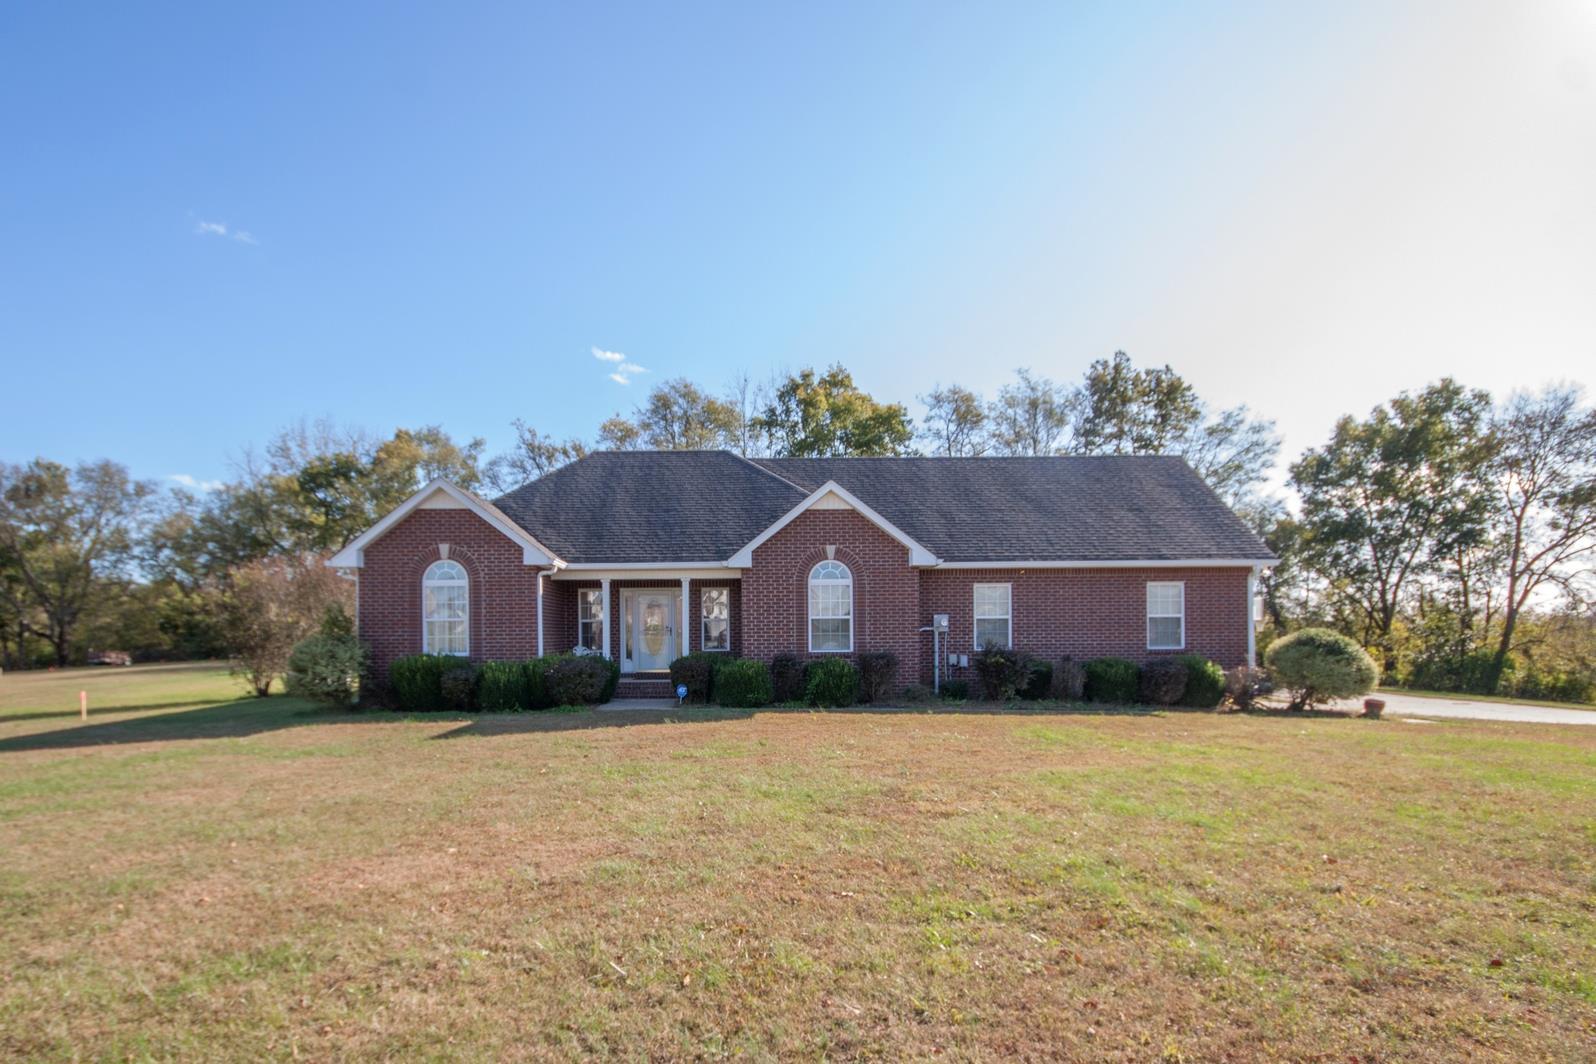 1012 Hiltonwood Blvd, Castalian Springs, TN 37031 - Castalian Springs, TN real estate listing